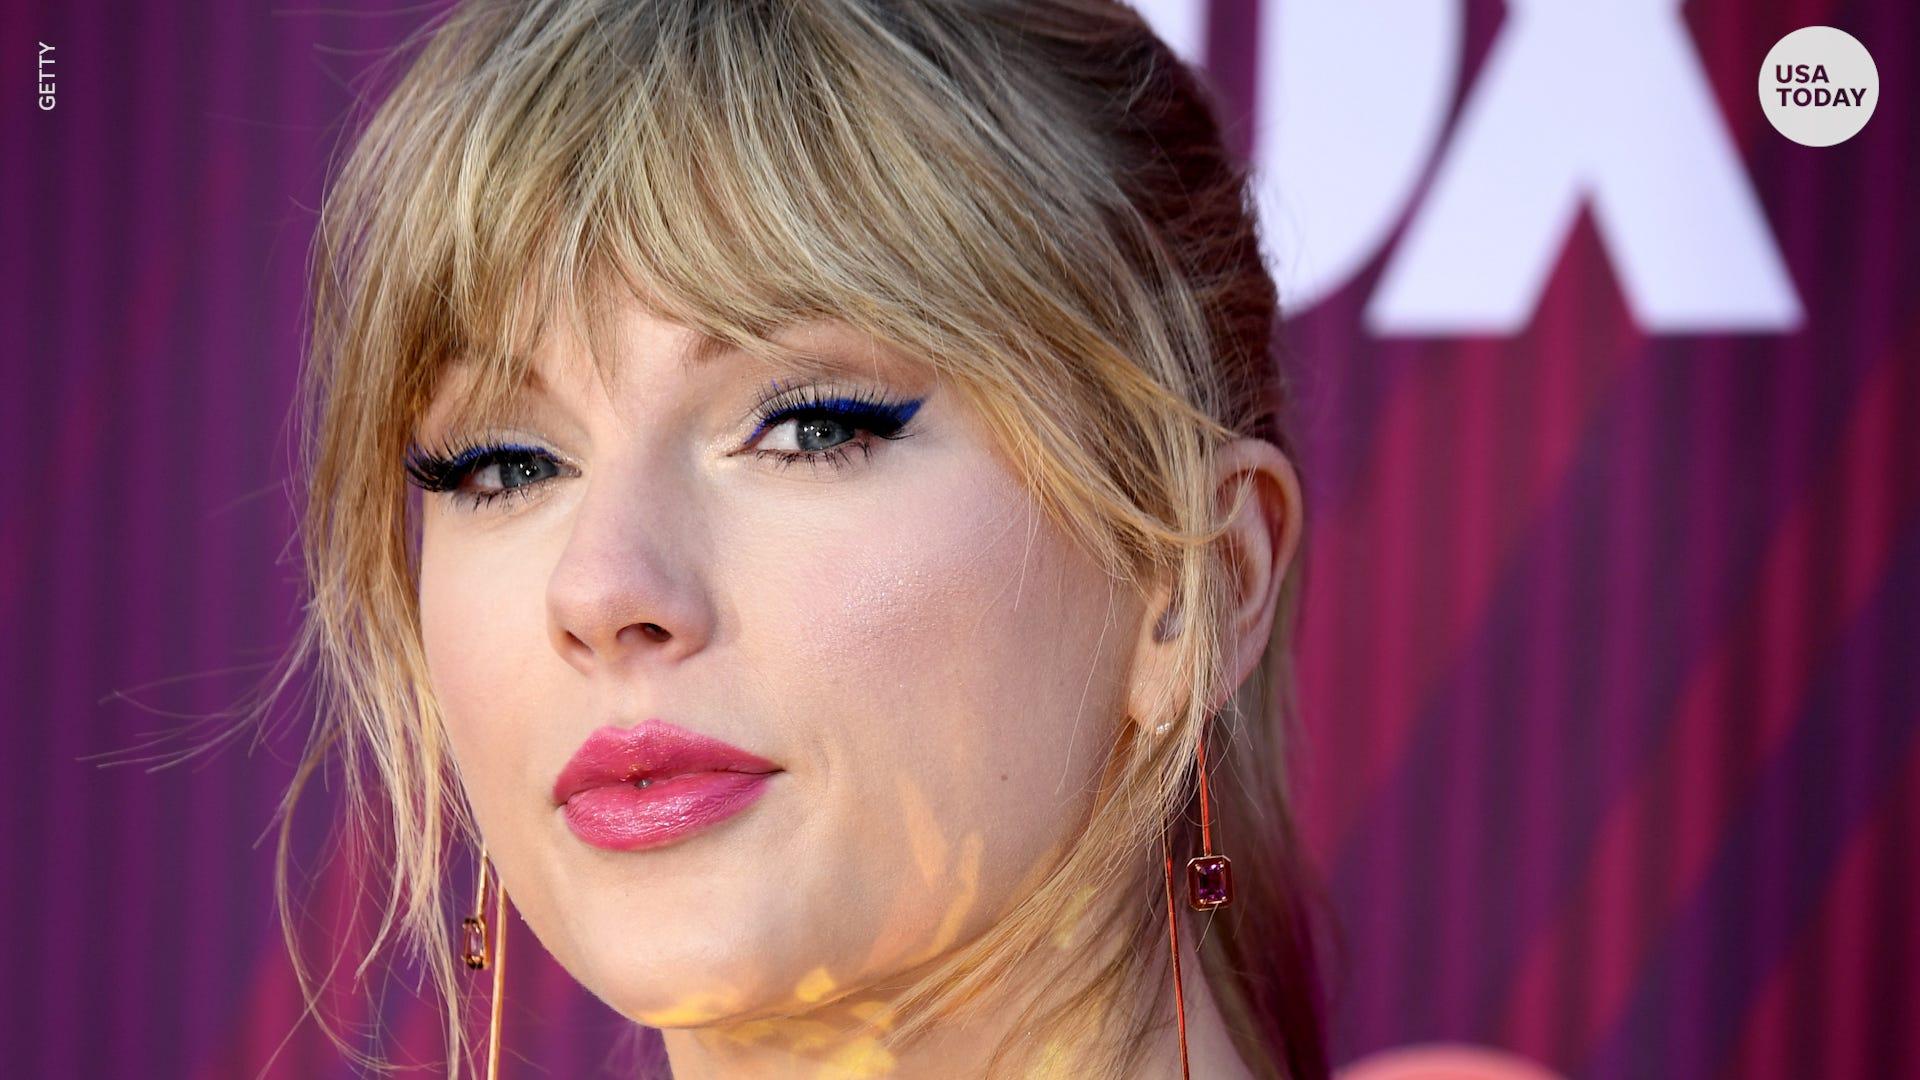 Taylor Swift slammed by Justin Bieber amid music executive drama